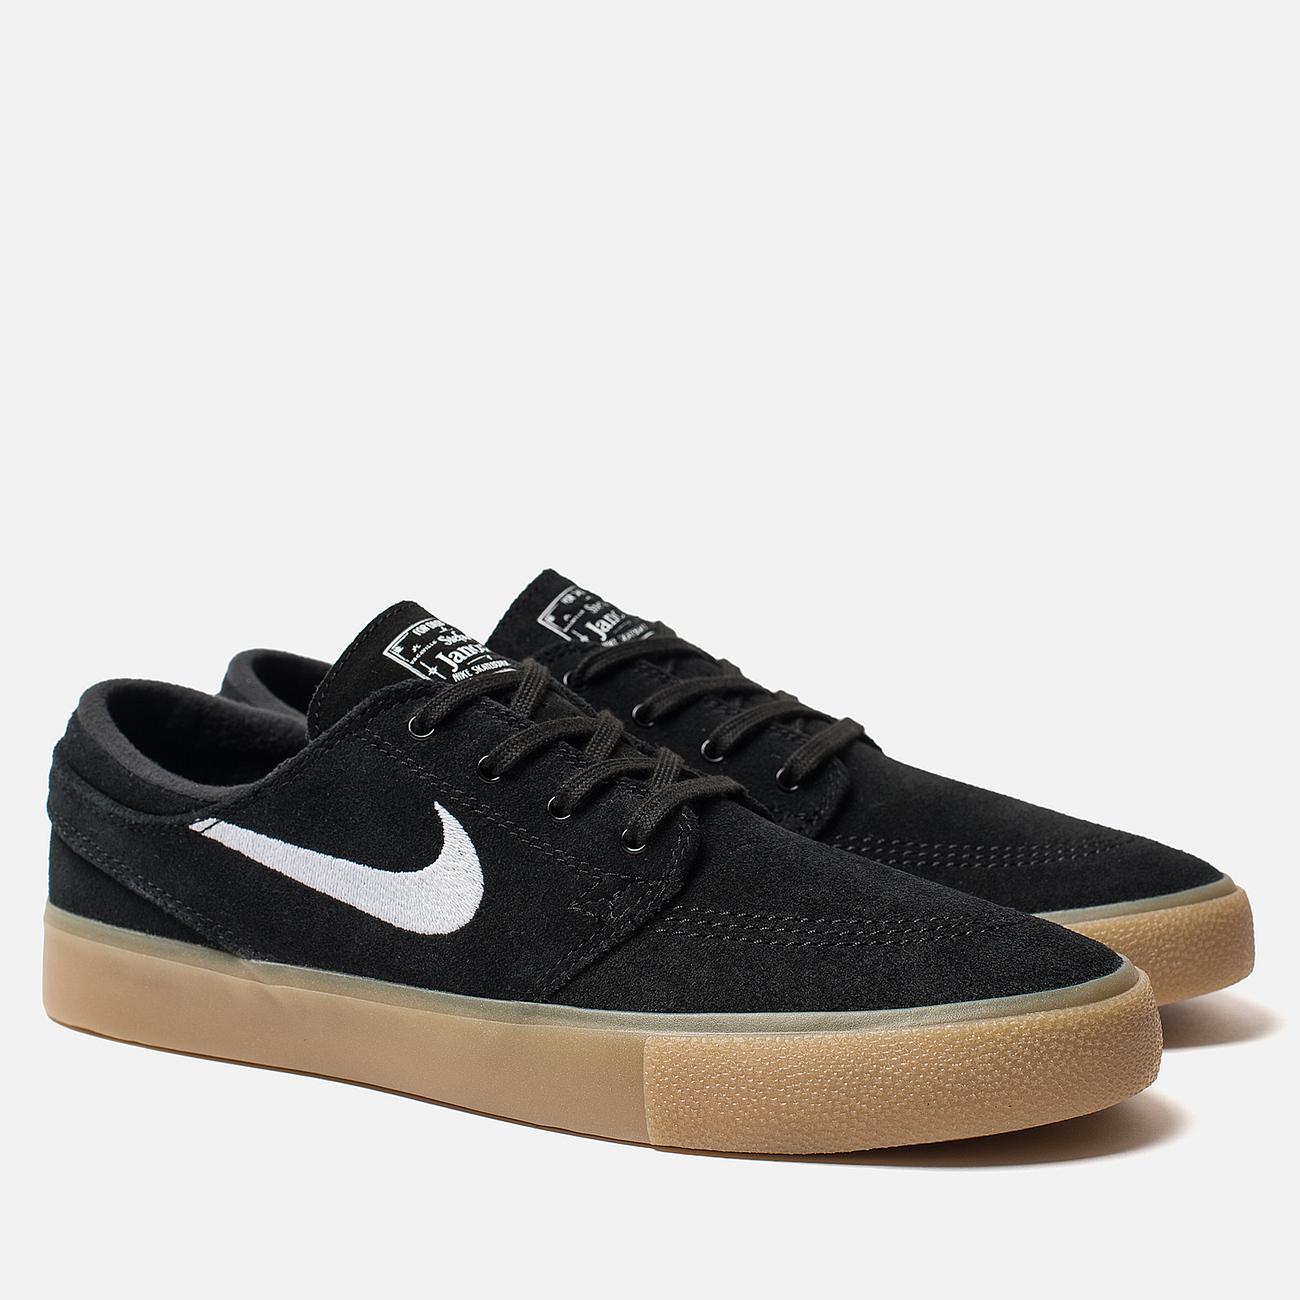 Мужские кроссовки Nike SB Zoom Stefan Janoski Rm Black/White/Black/Gum Light Brown